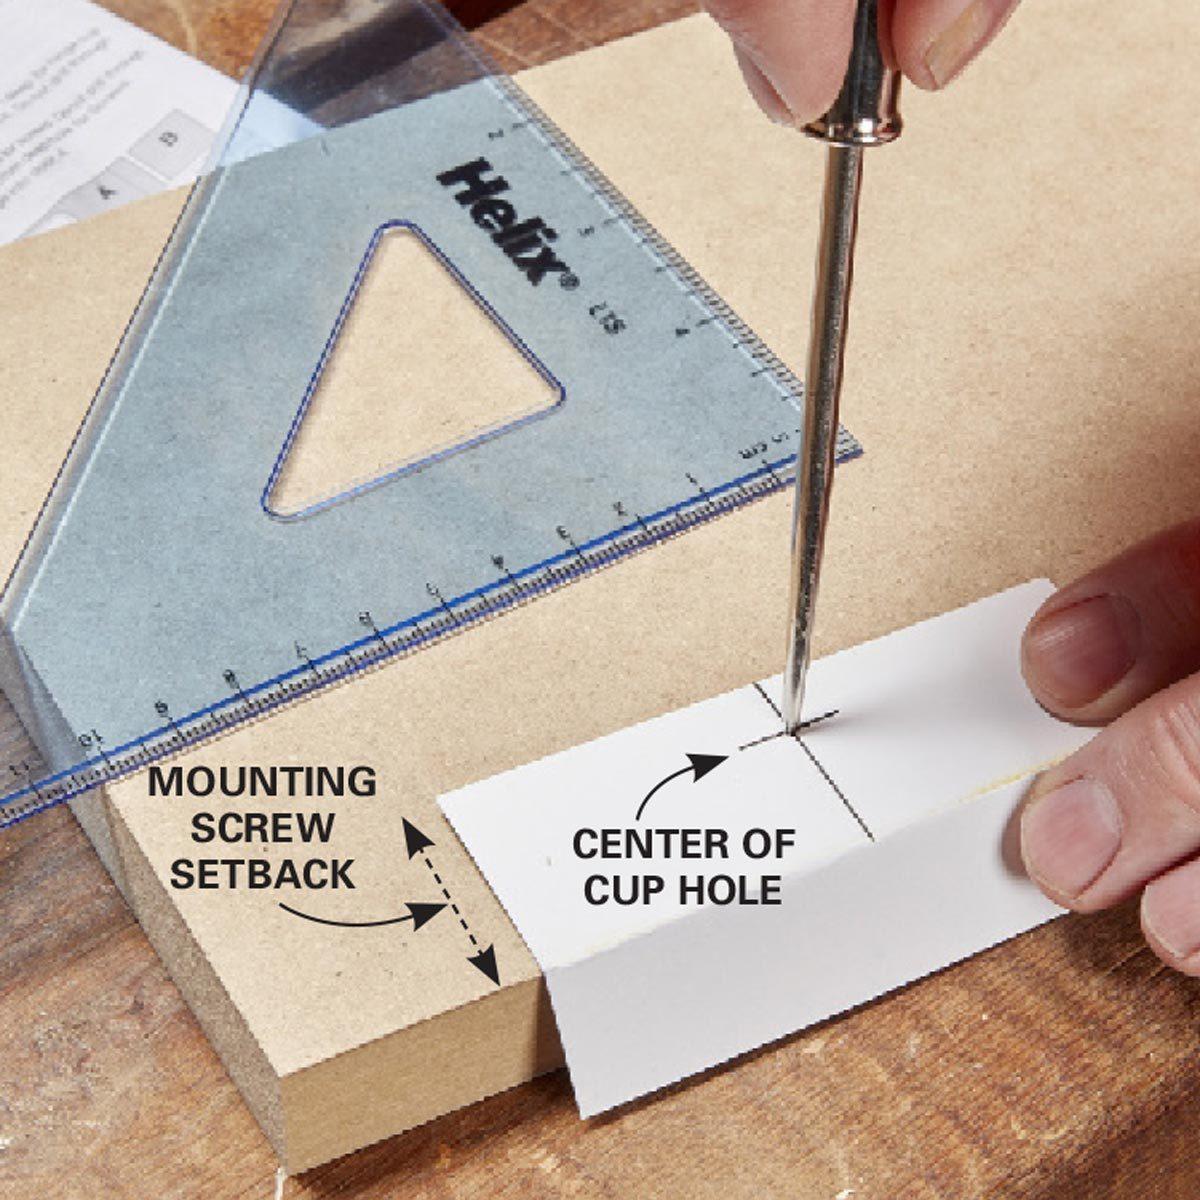 1. Make a template